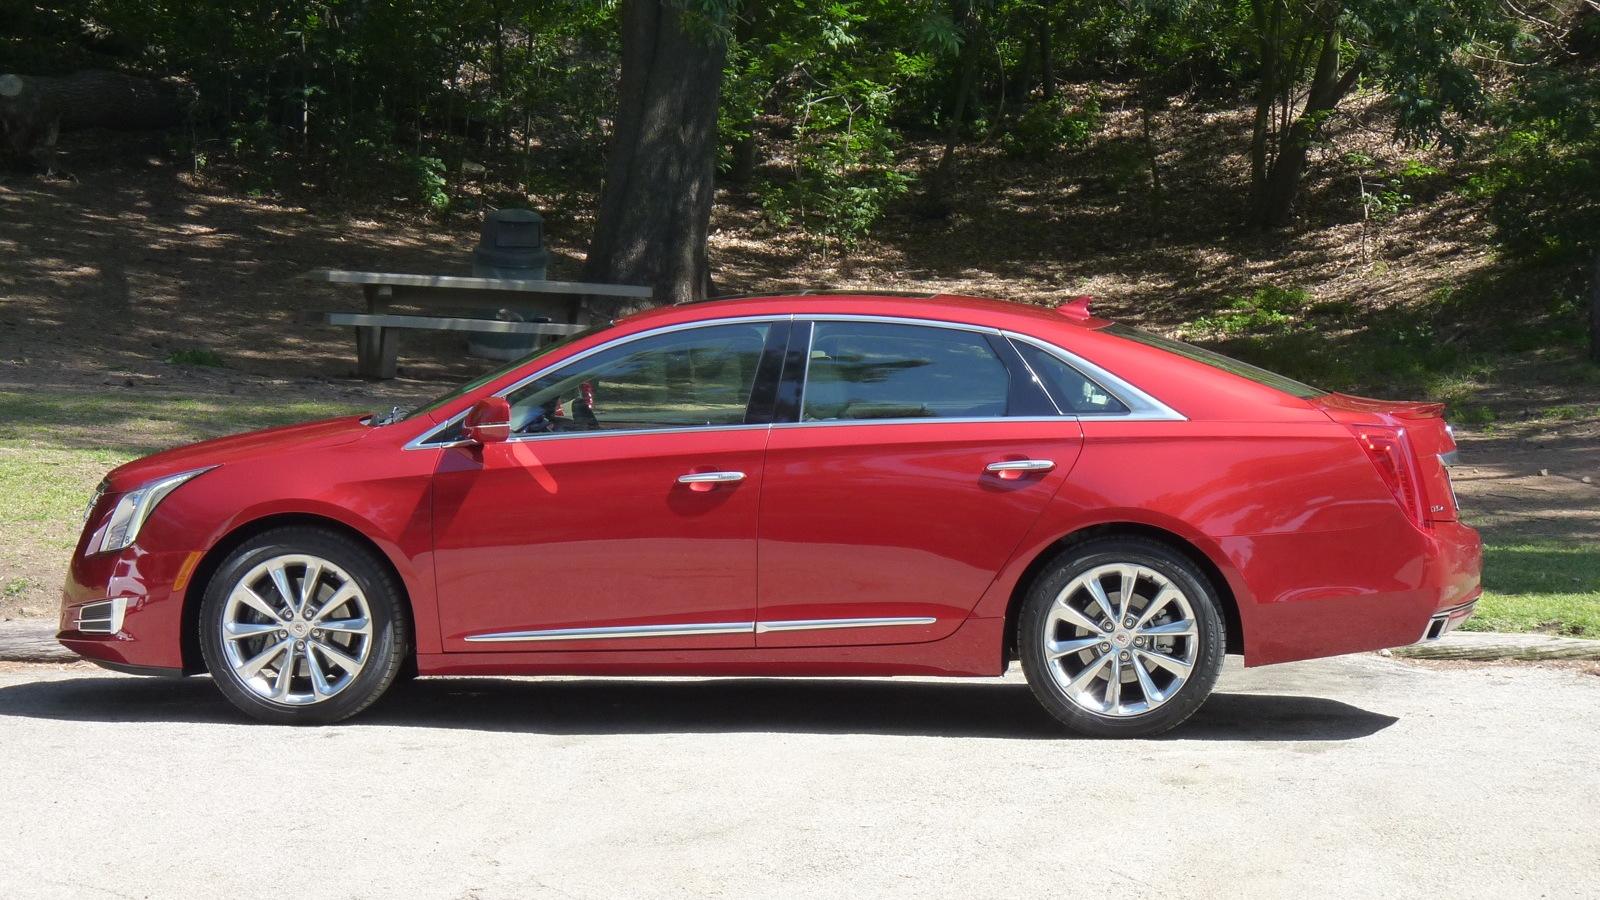 2013 Cadillac XTS first drive review